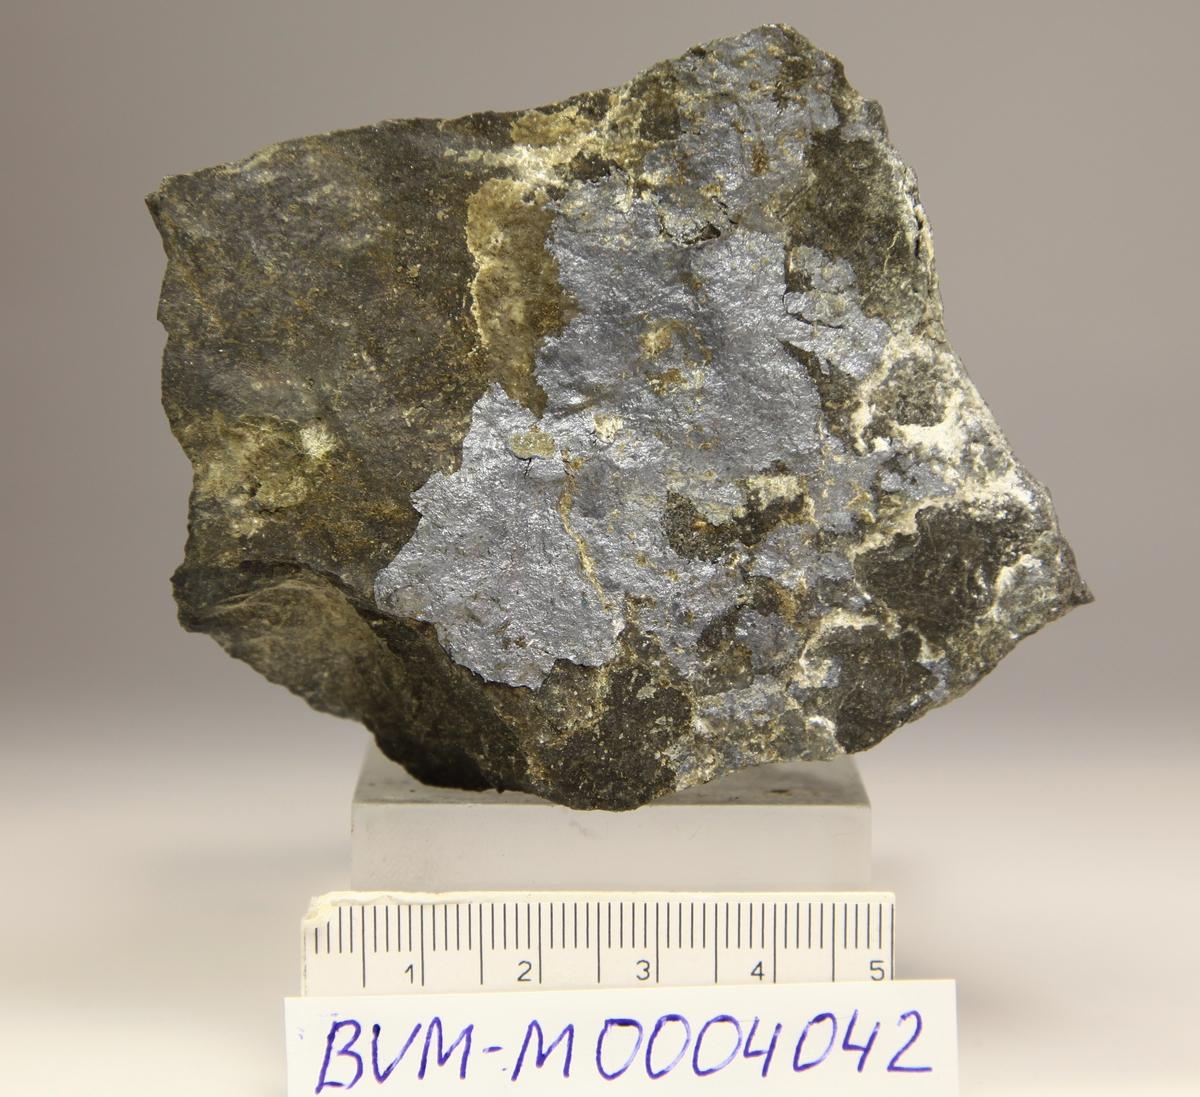 Acanthitt, tynt lag på matriks. Nueva Nevada Mine, Batopilas, Chihuahua, Mexico.